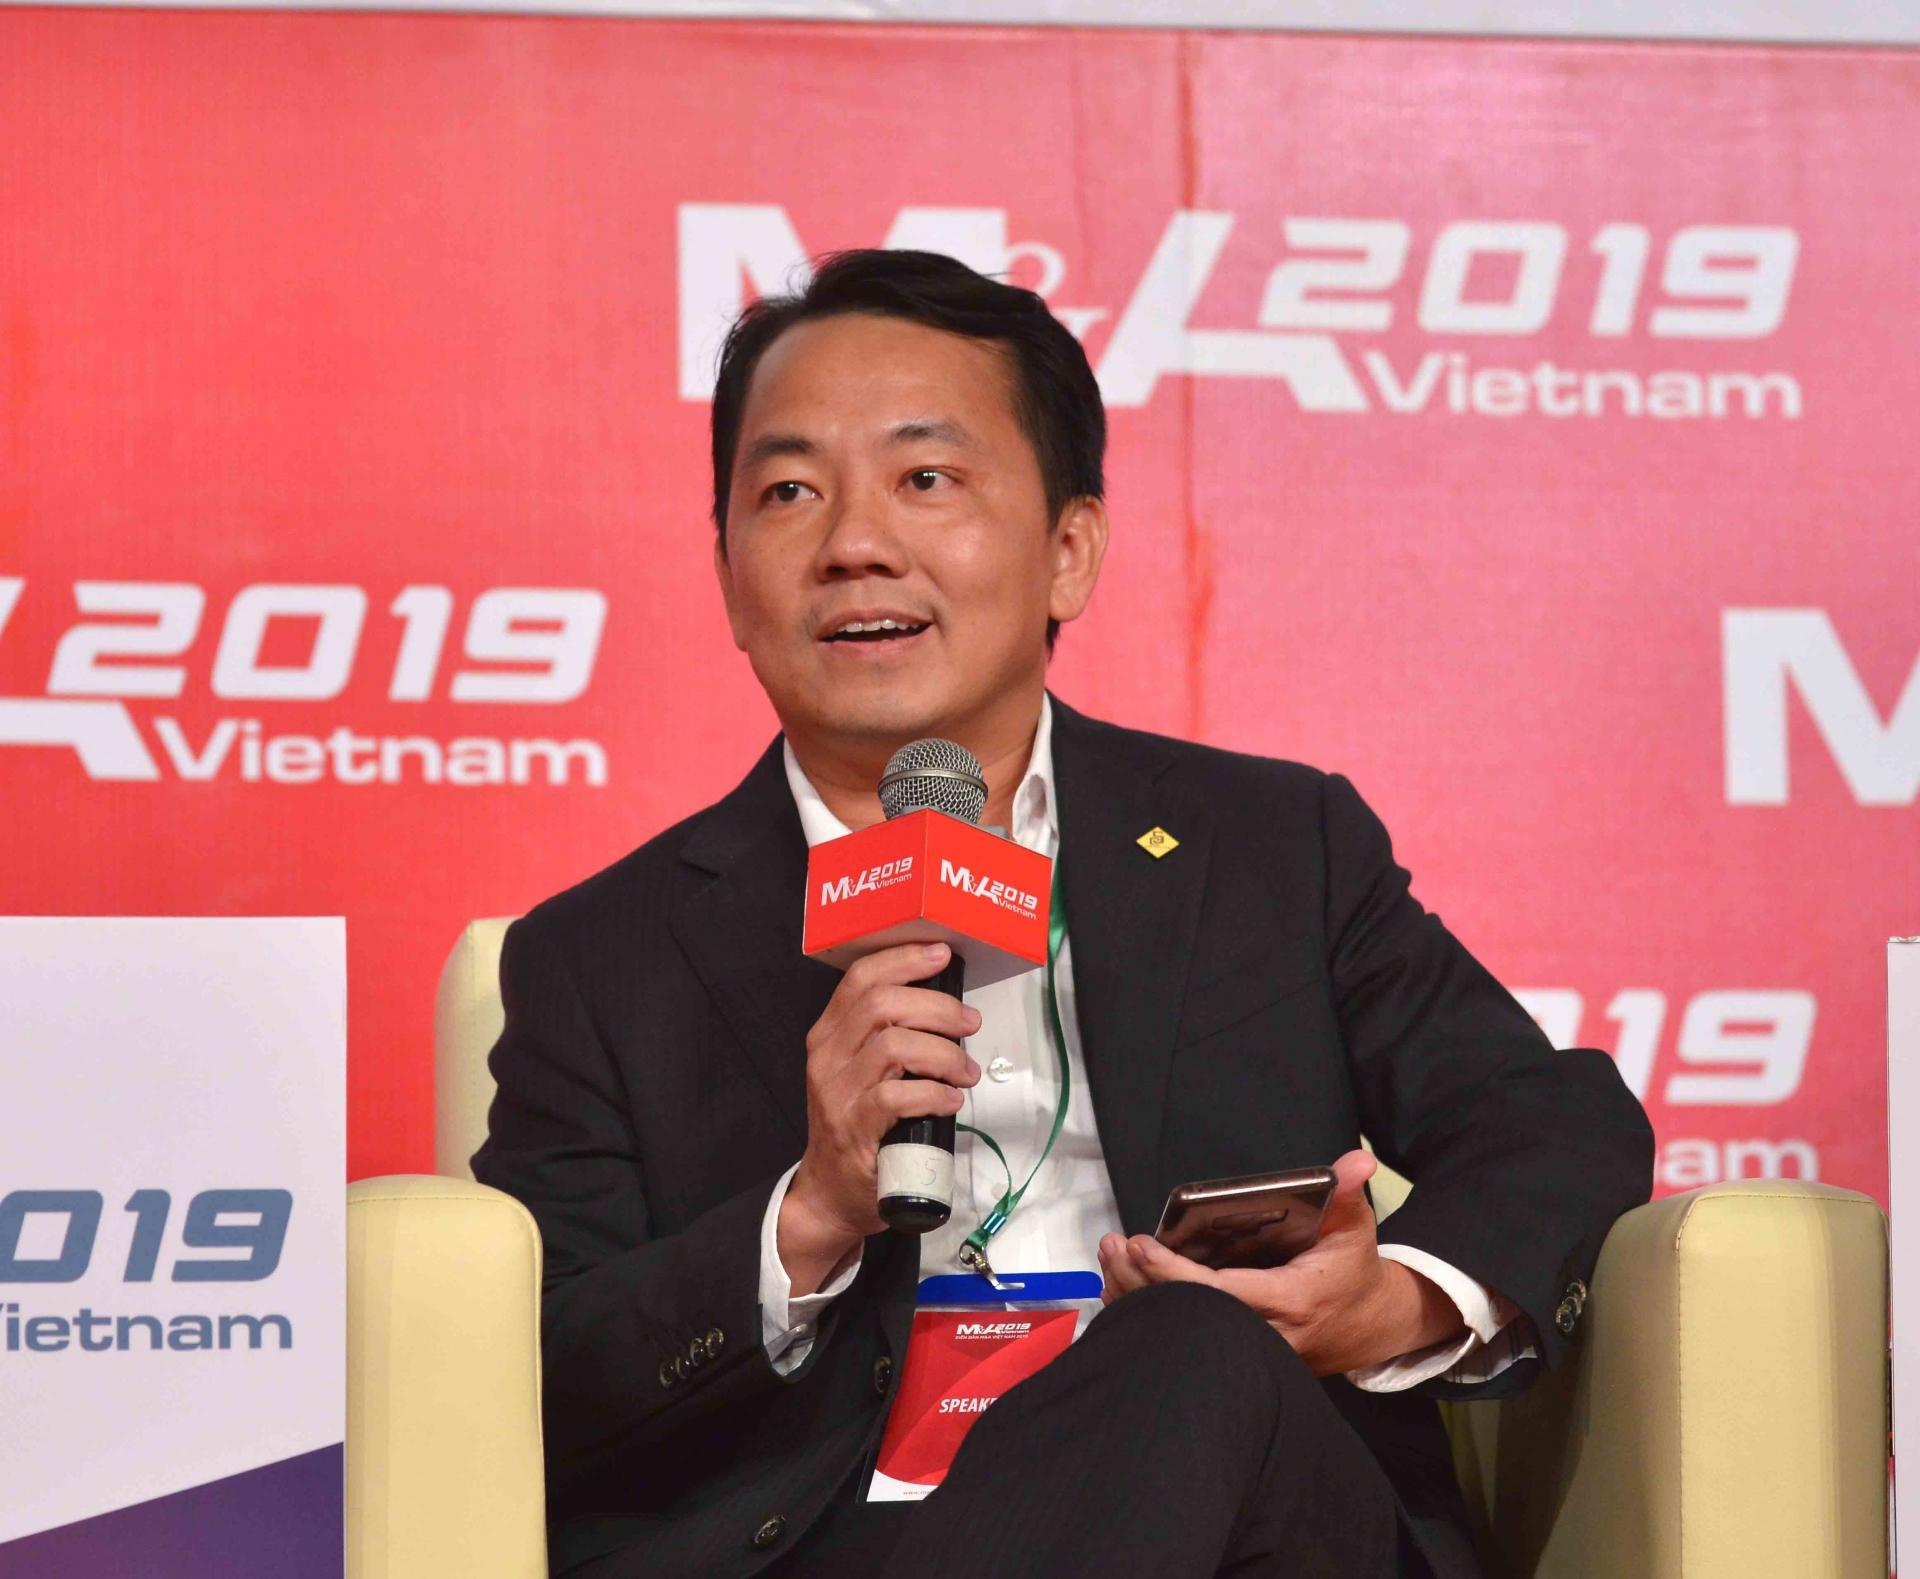 vietnam ma forum explores brand development post ma